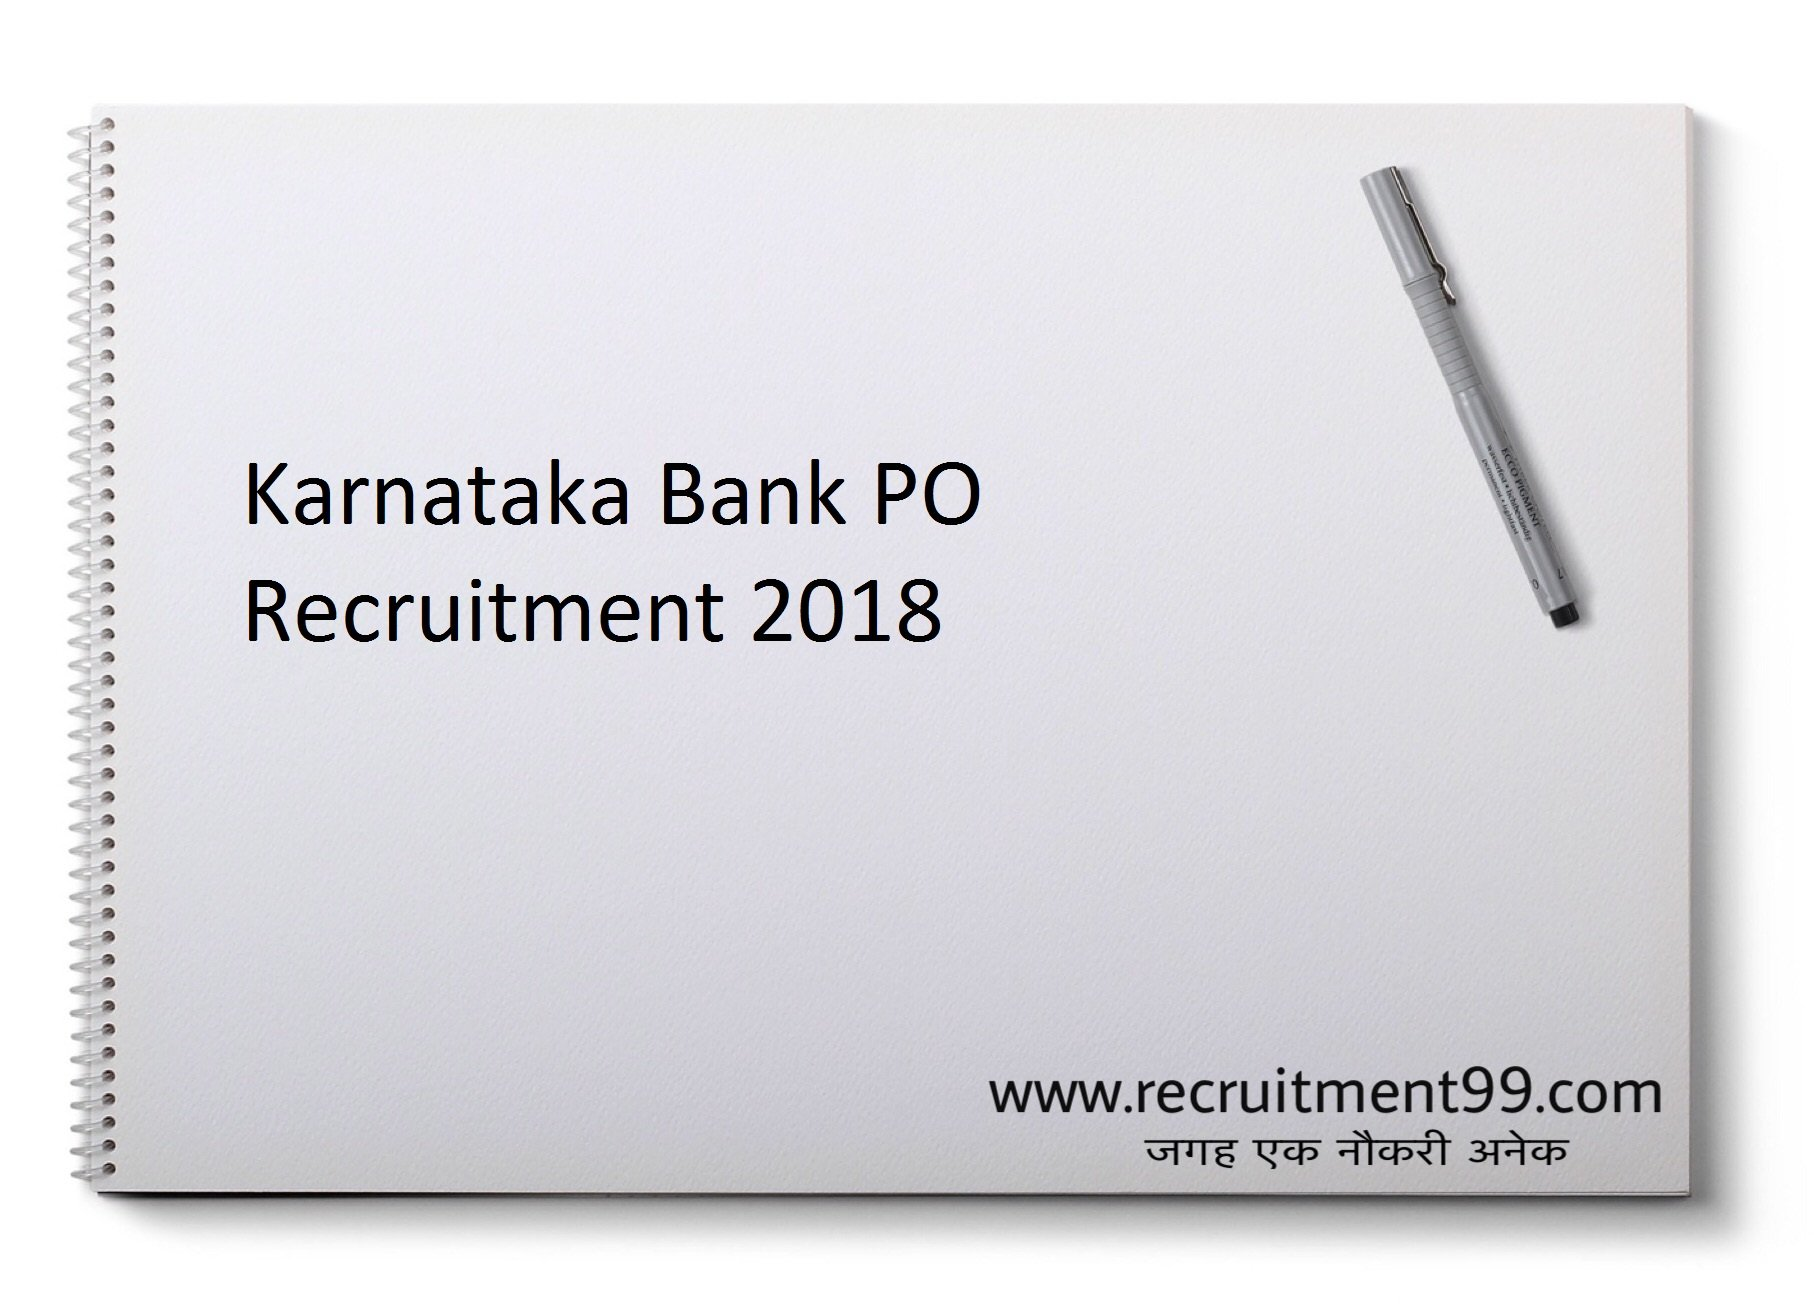 Karnataka Bank PO Recruitment 2018 - 4 CA, RM, AFO & Law Officer Posts